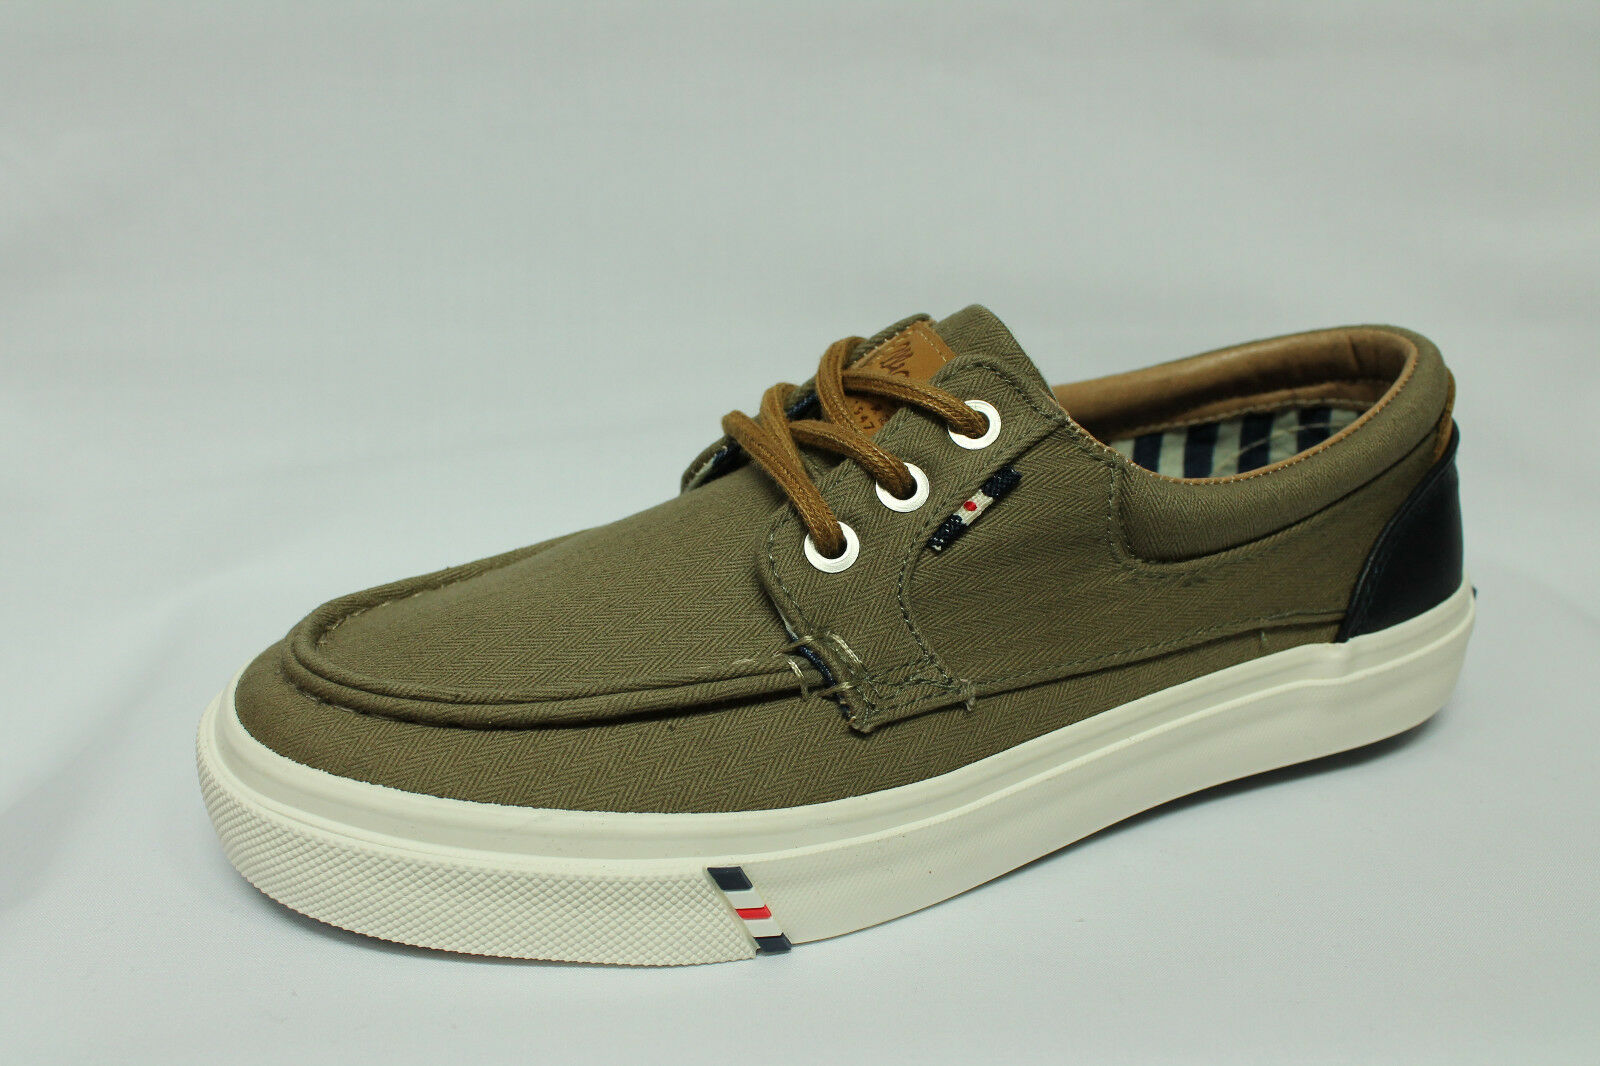 Sneakers Wrangler Icon Moc tessuto verde militare Memory Foam tipo Vans o Sperry